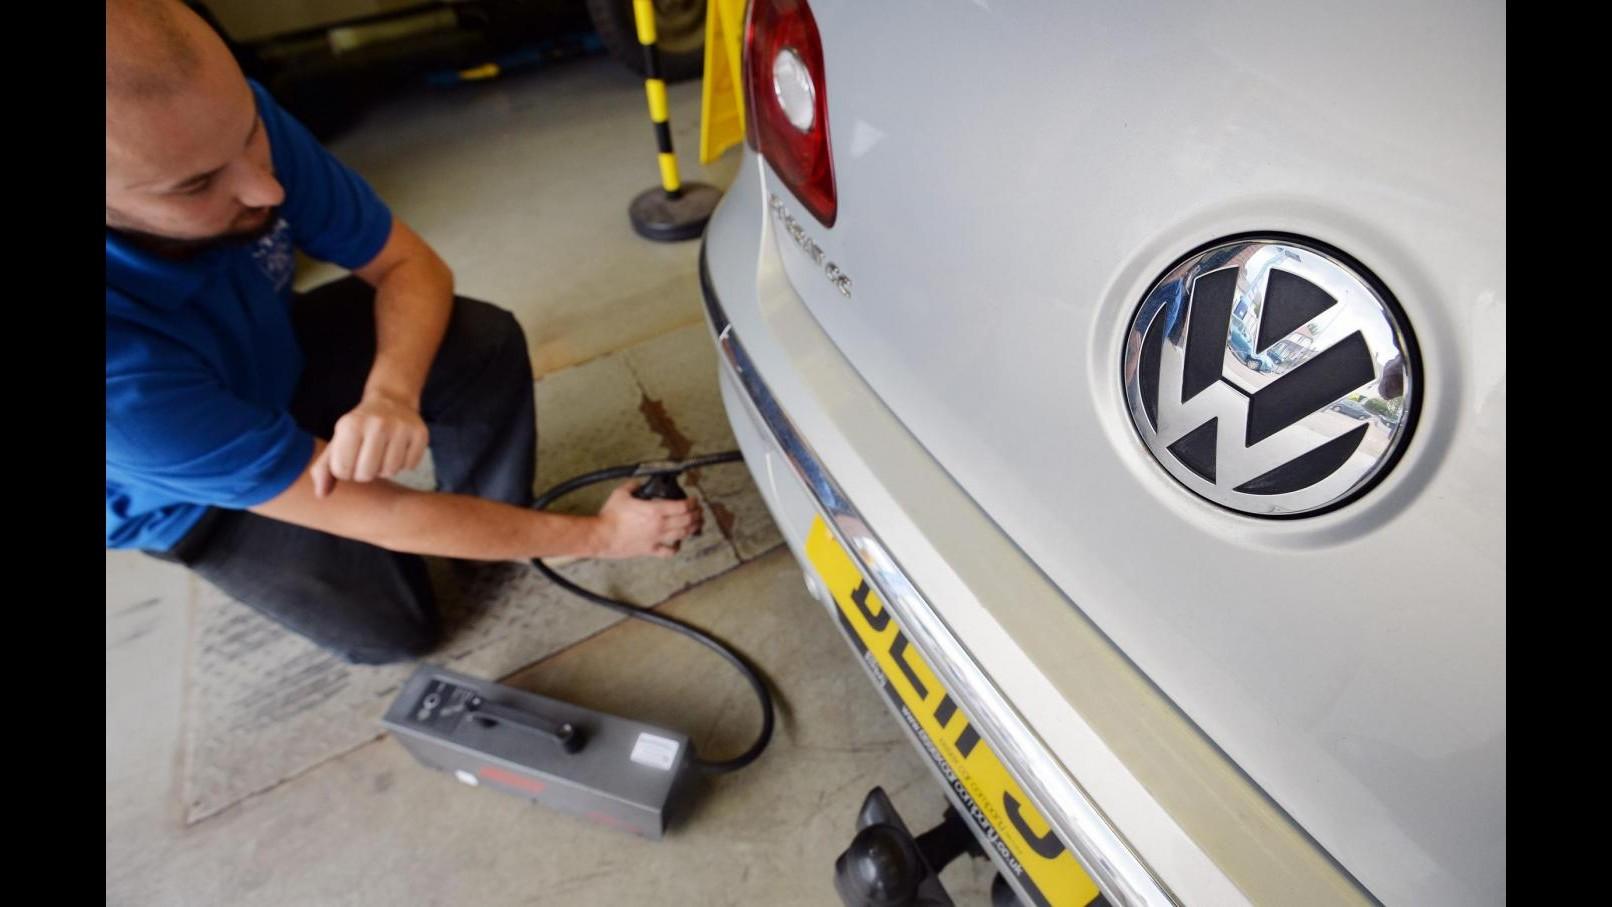 Volkswagen, Mueller a dipendenti: Gruppo in situazione drammatica